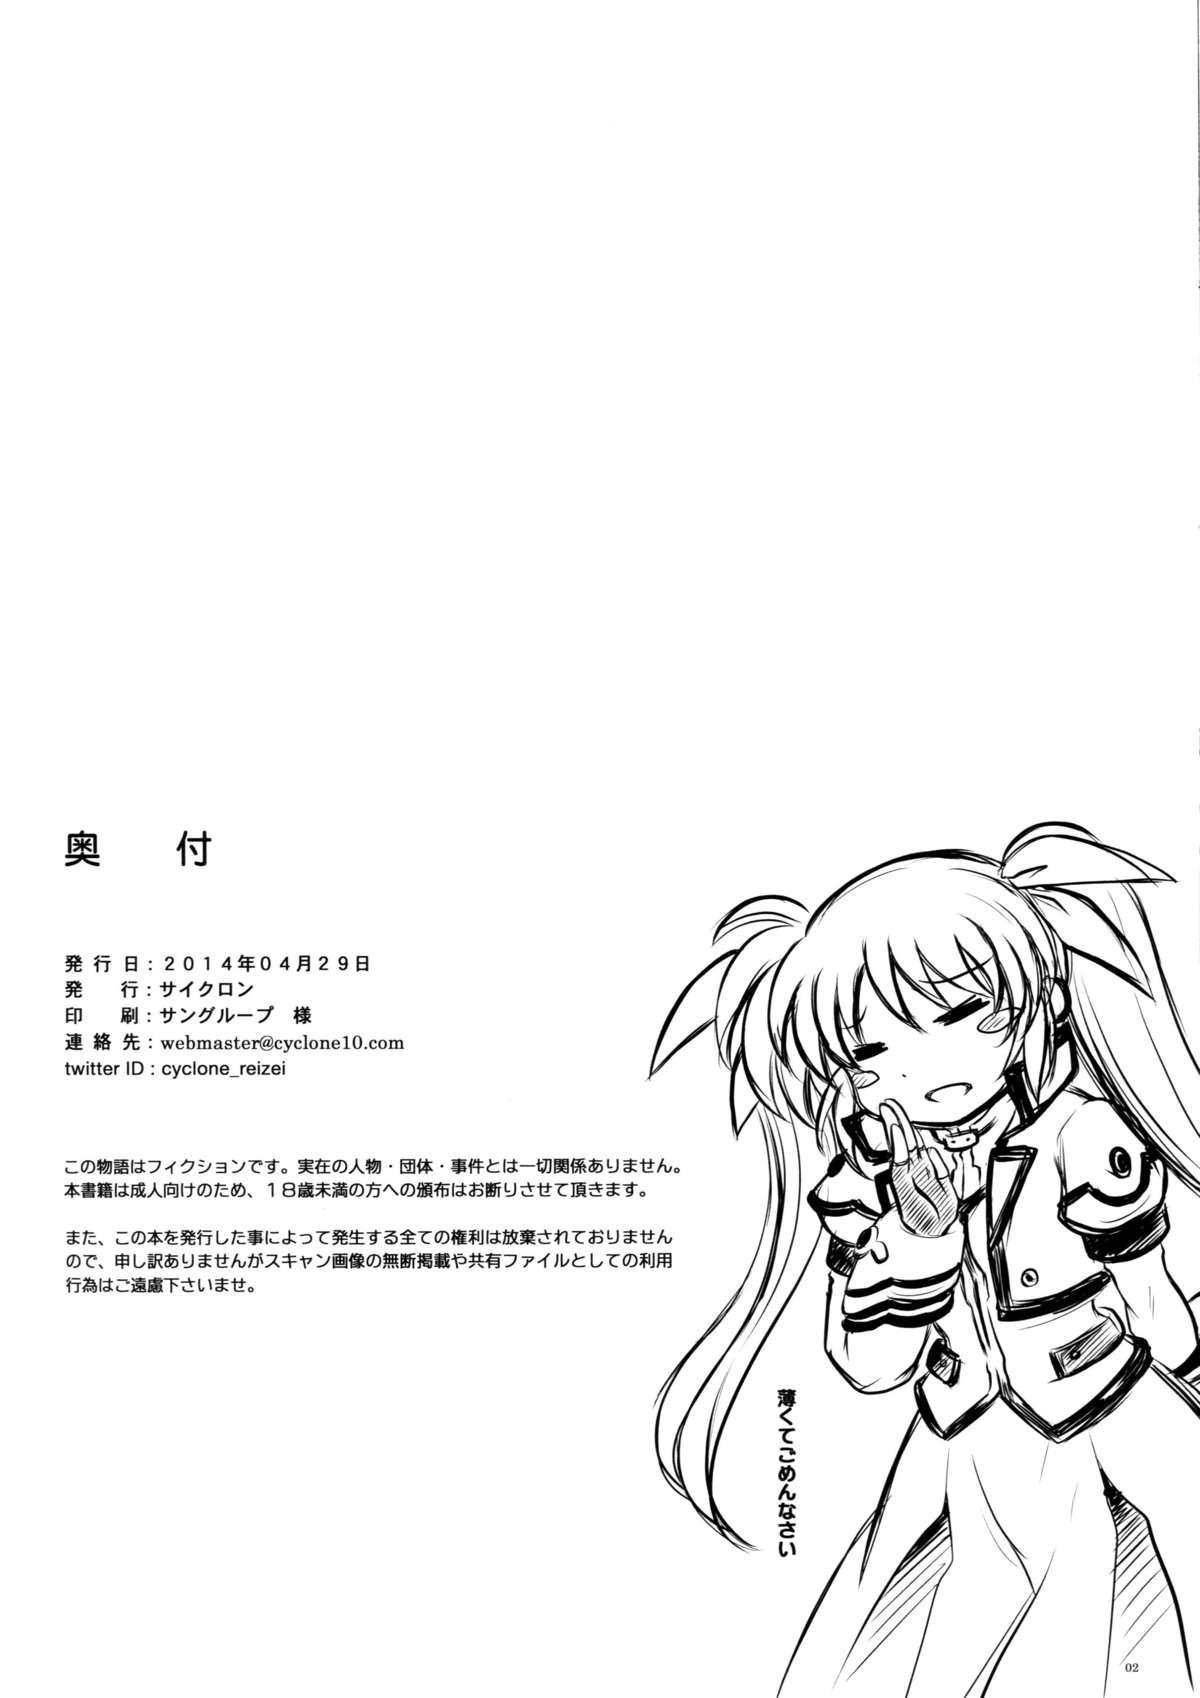 Gokuusu Kahitsuban Takamatic After 1